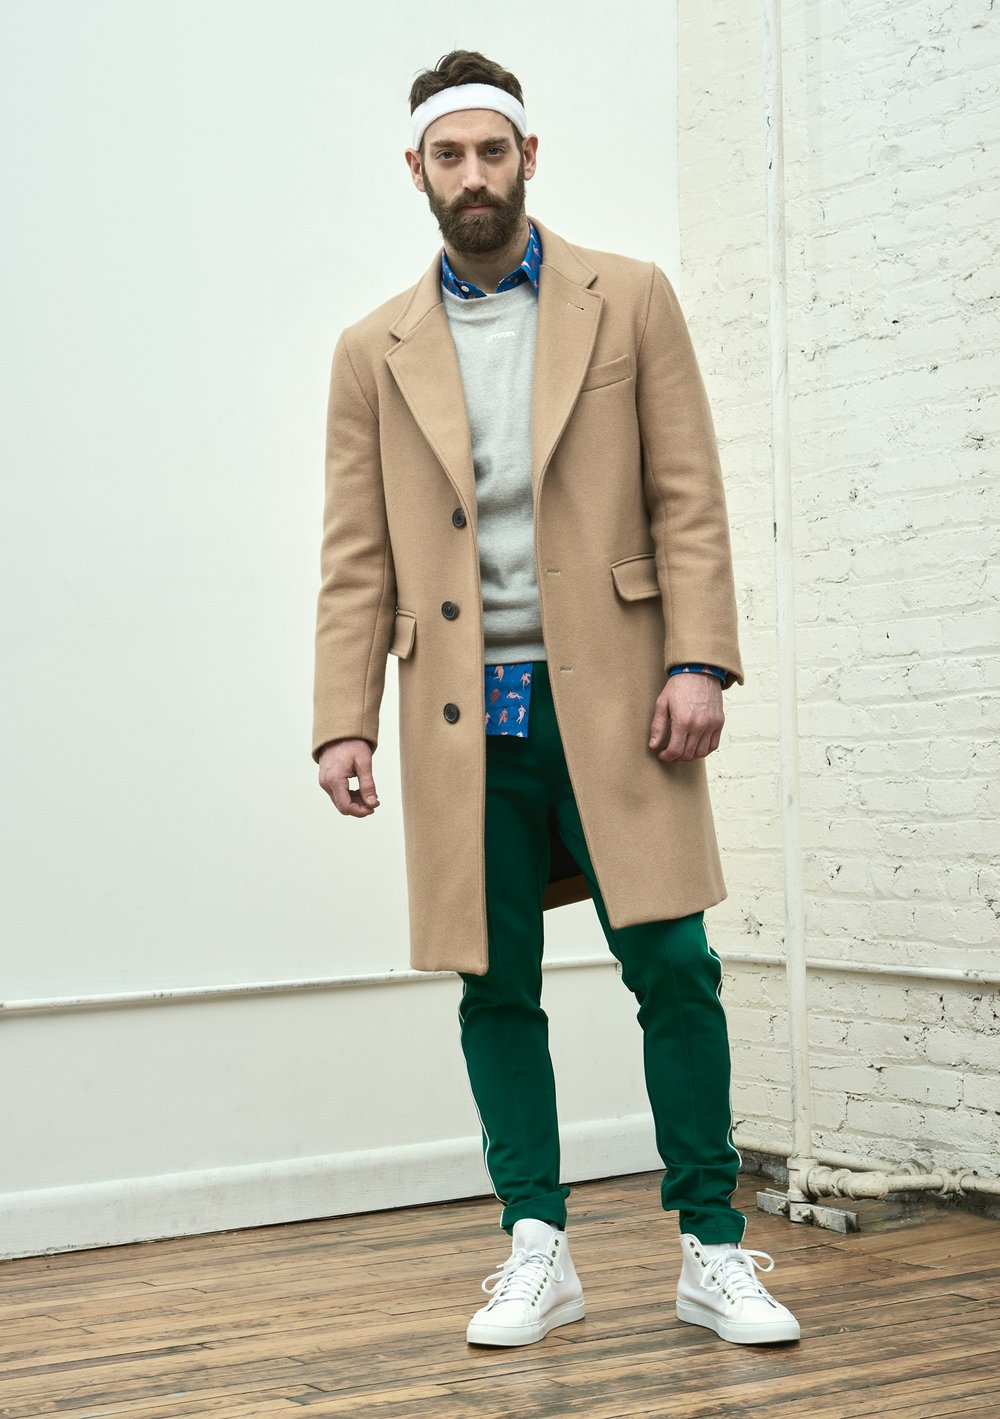 Band of Outsiders Fall 2017 Menswear